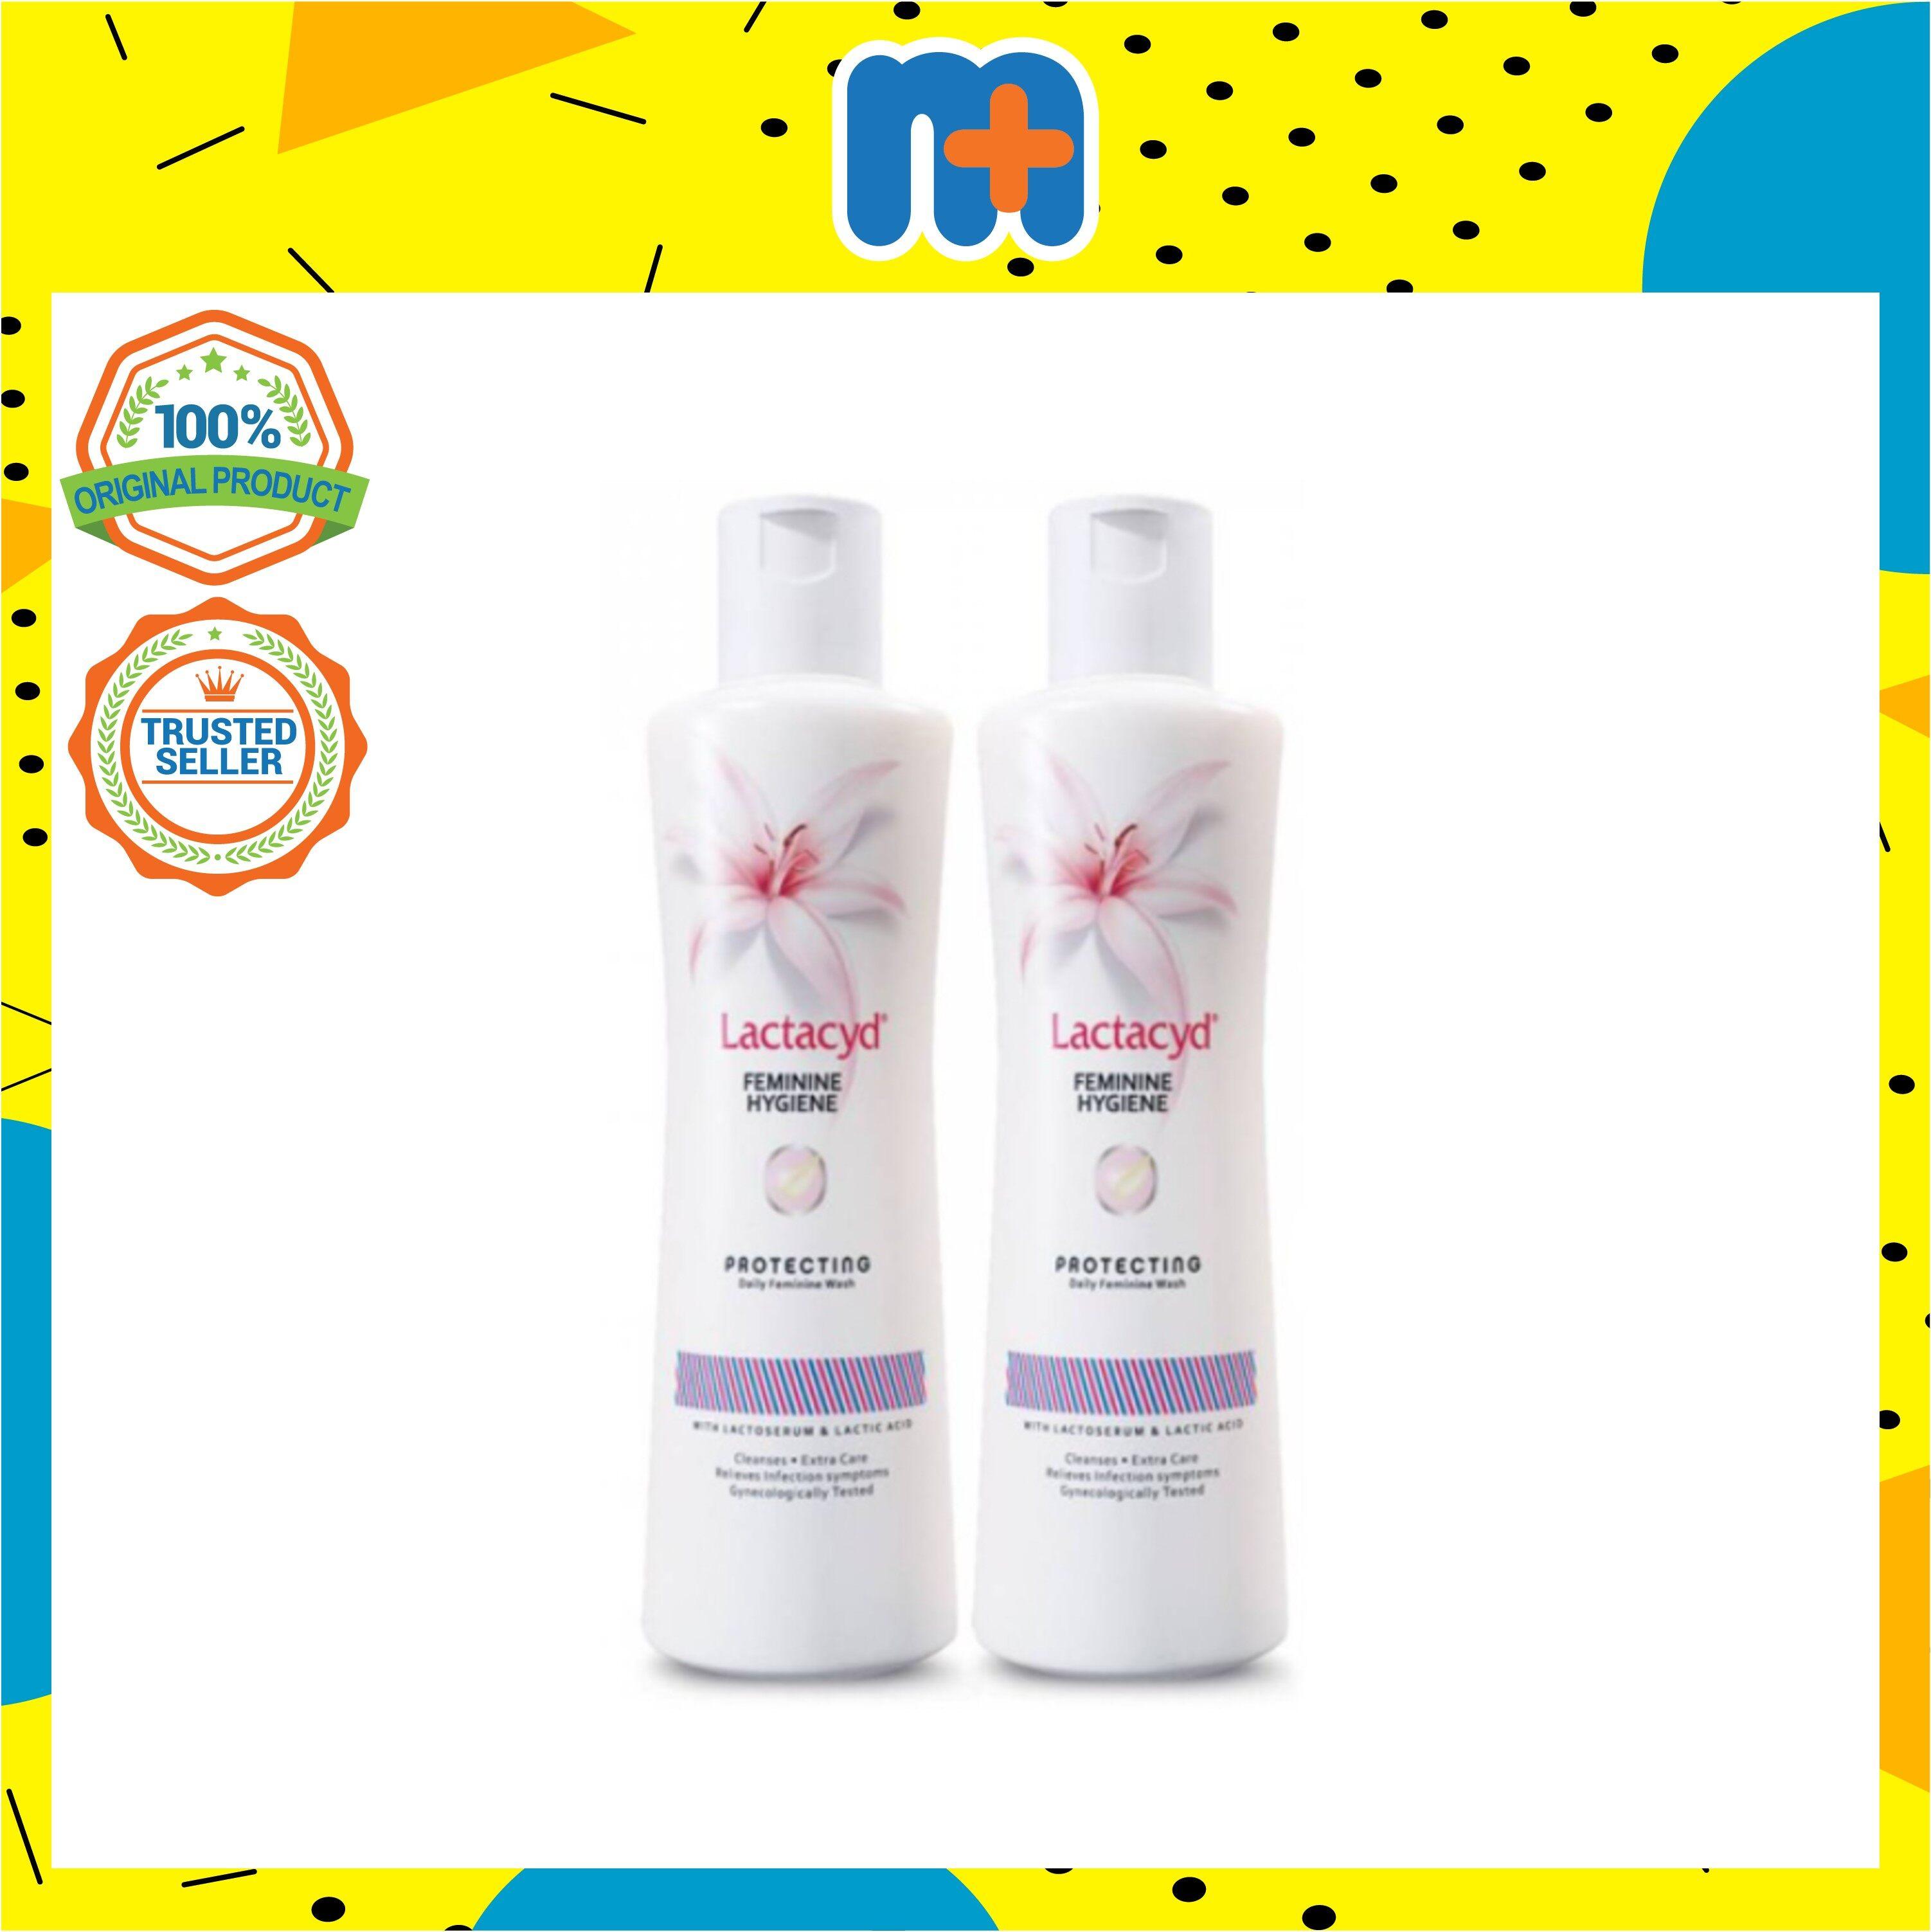 [MPLUS] LACTACYD Feminine Hygiene 2x250ml